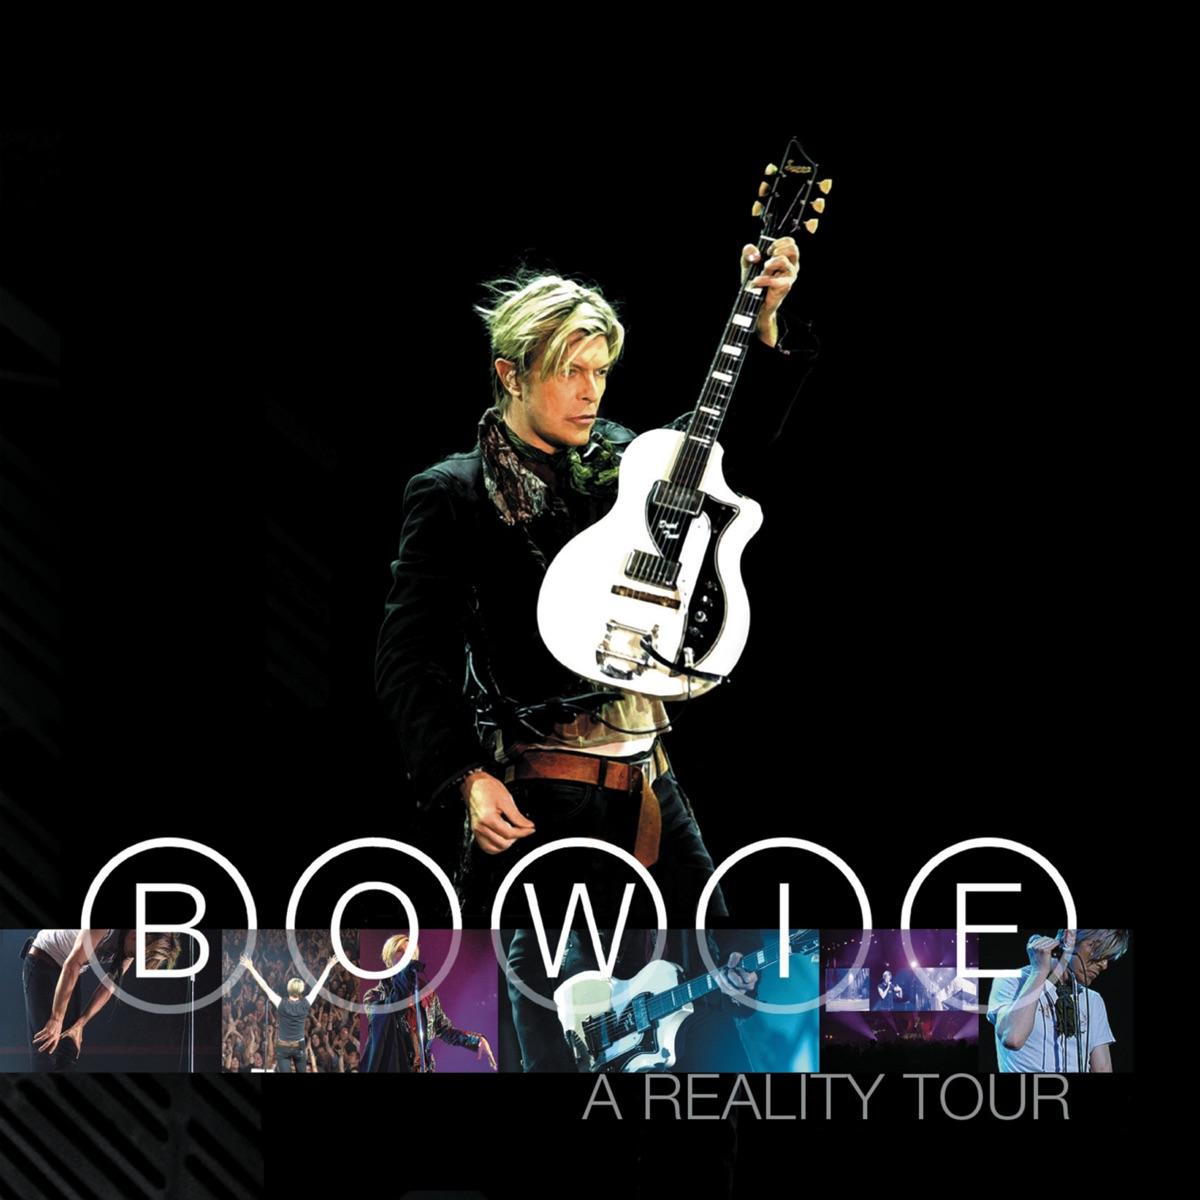 A Reality Tour Bonus Track Version Live David Bowie CD cover